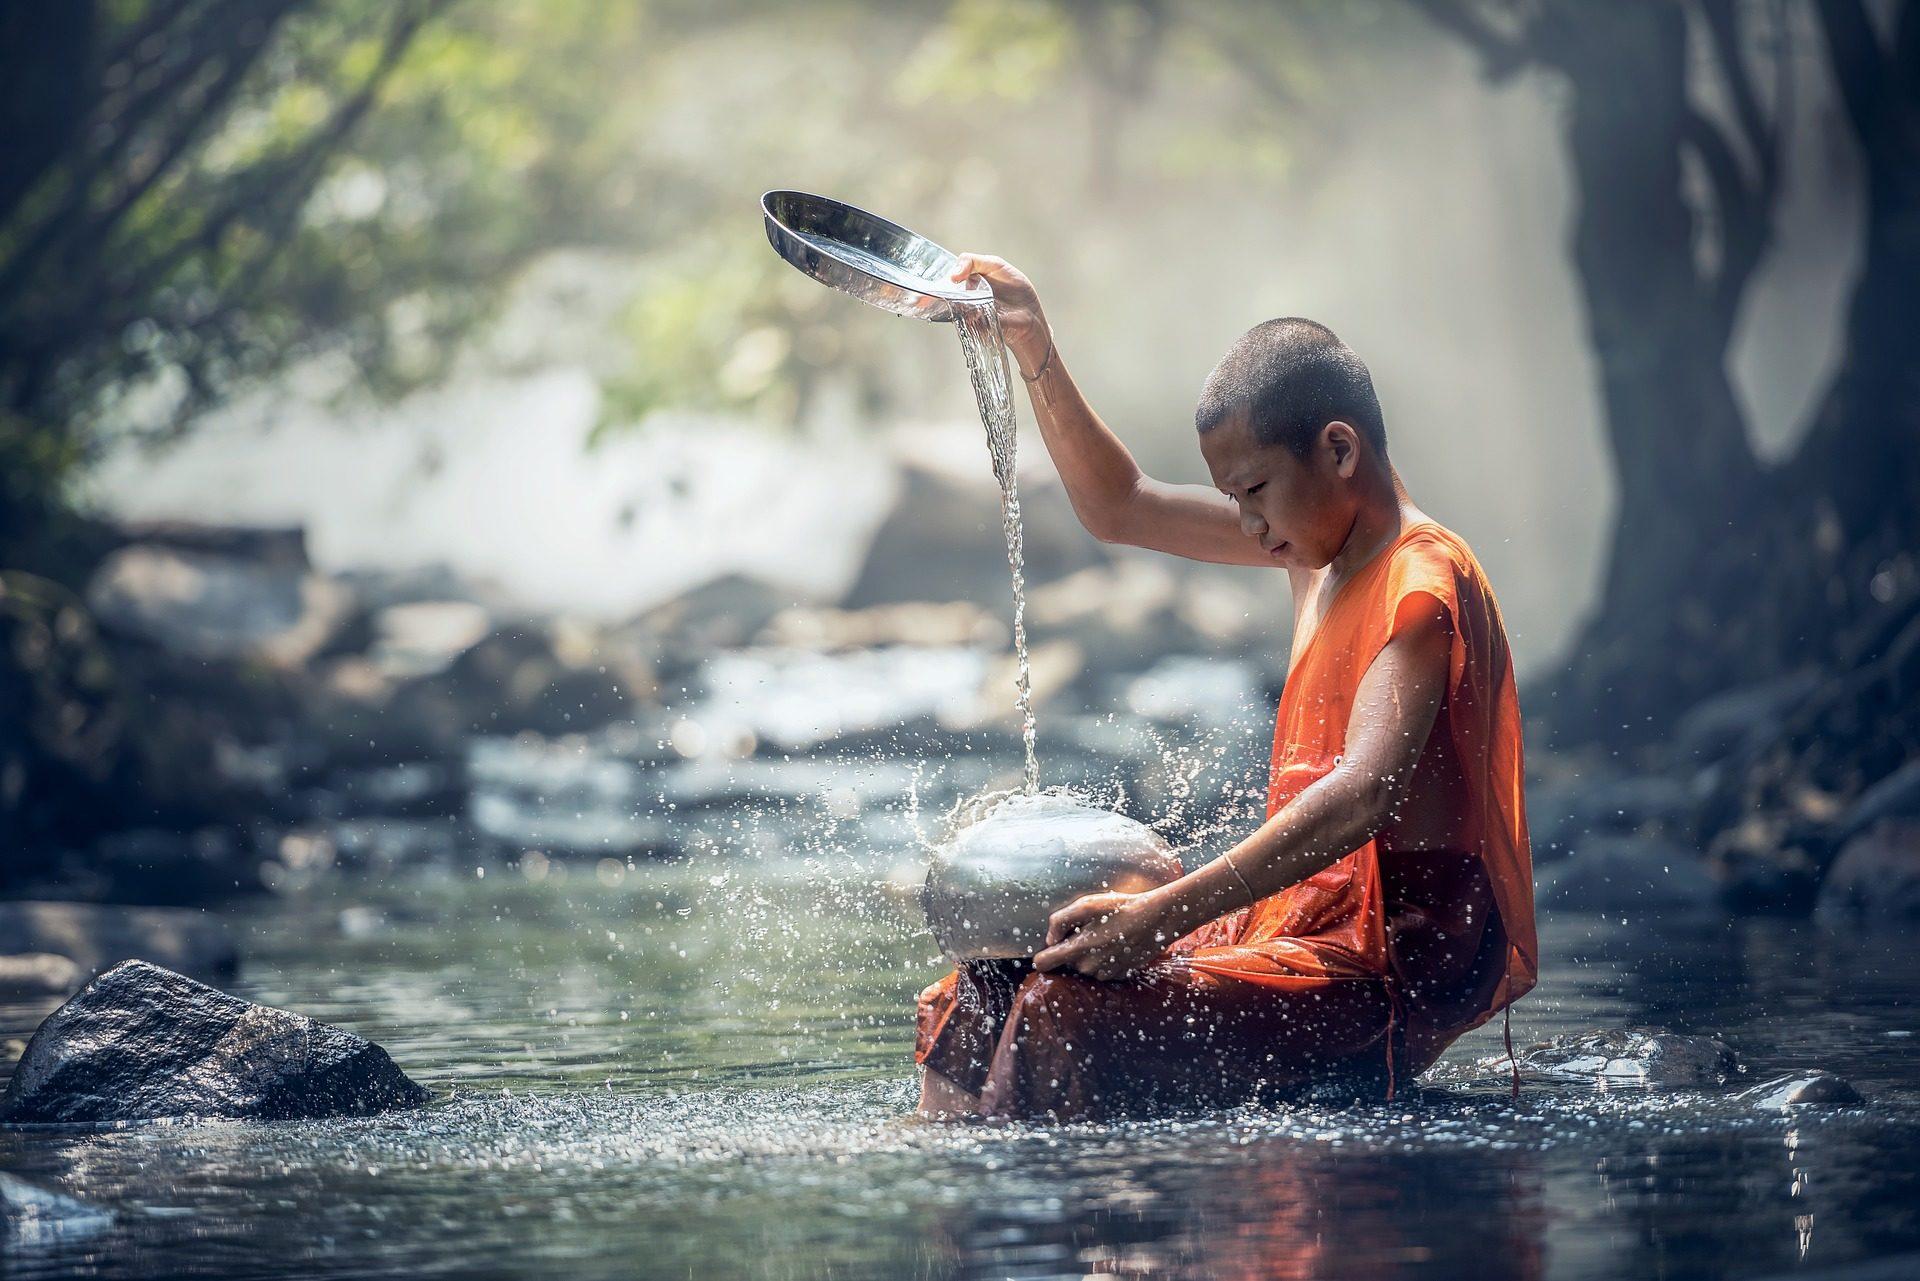 Guy, Río, Buddhismus, Meditation, Religion, Östlichen, Spiritualität - Wallpaper HD - Prof.-falken.com